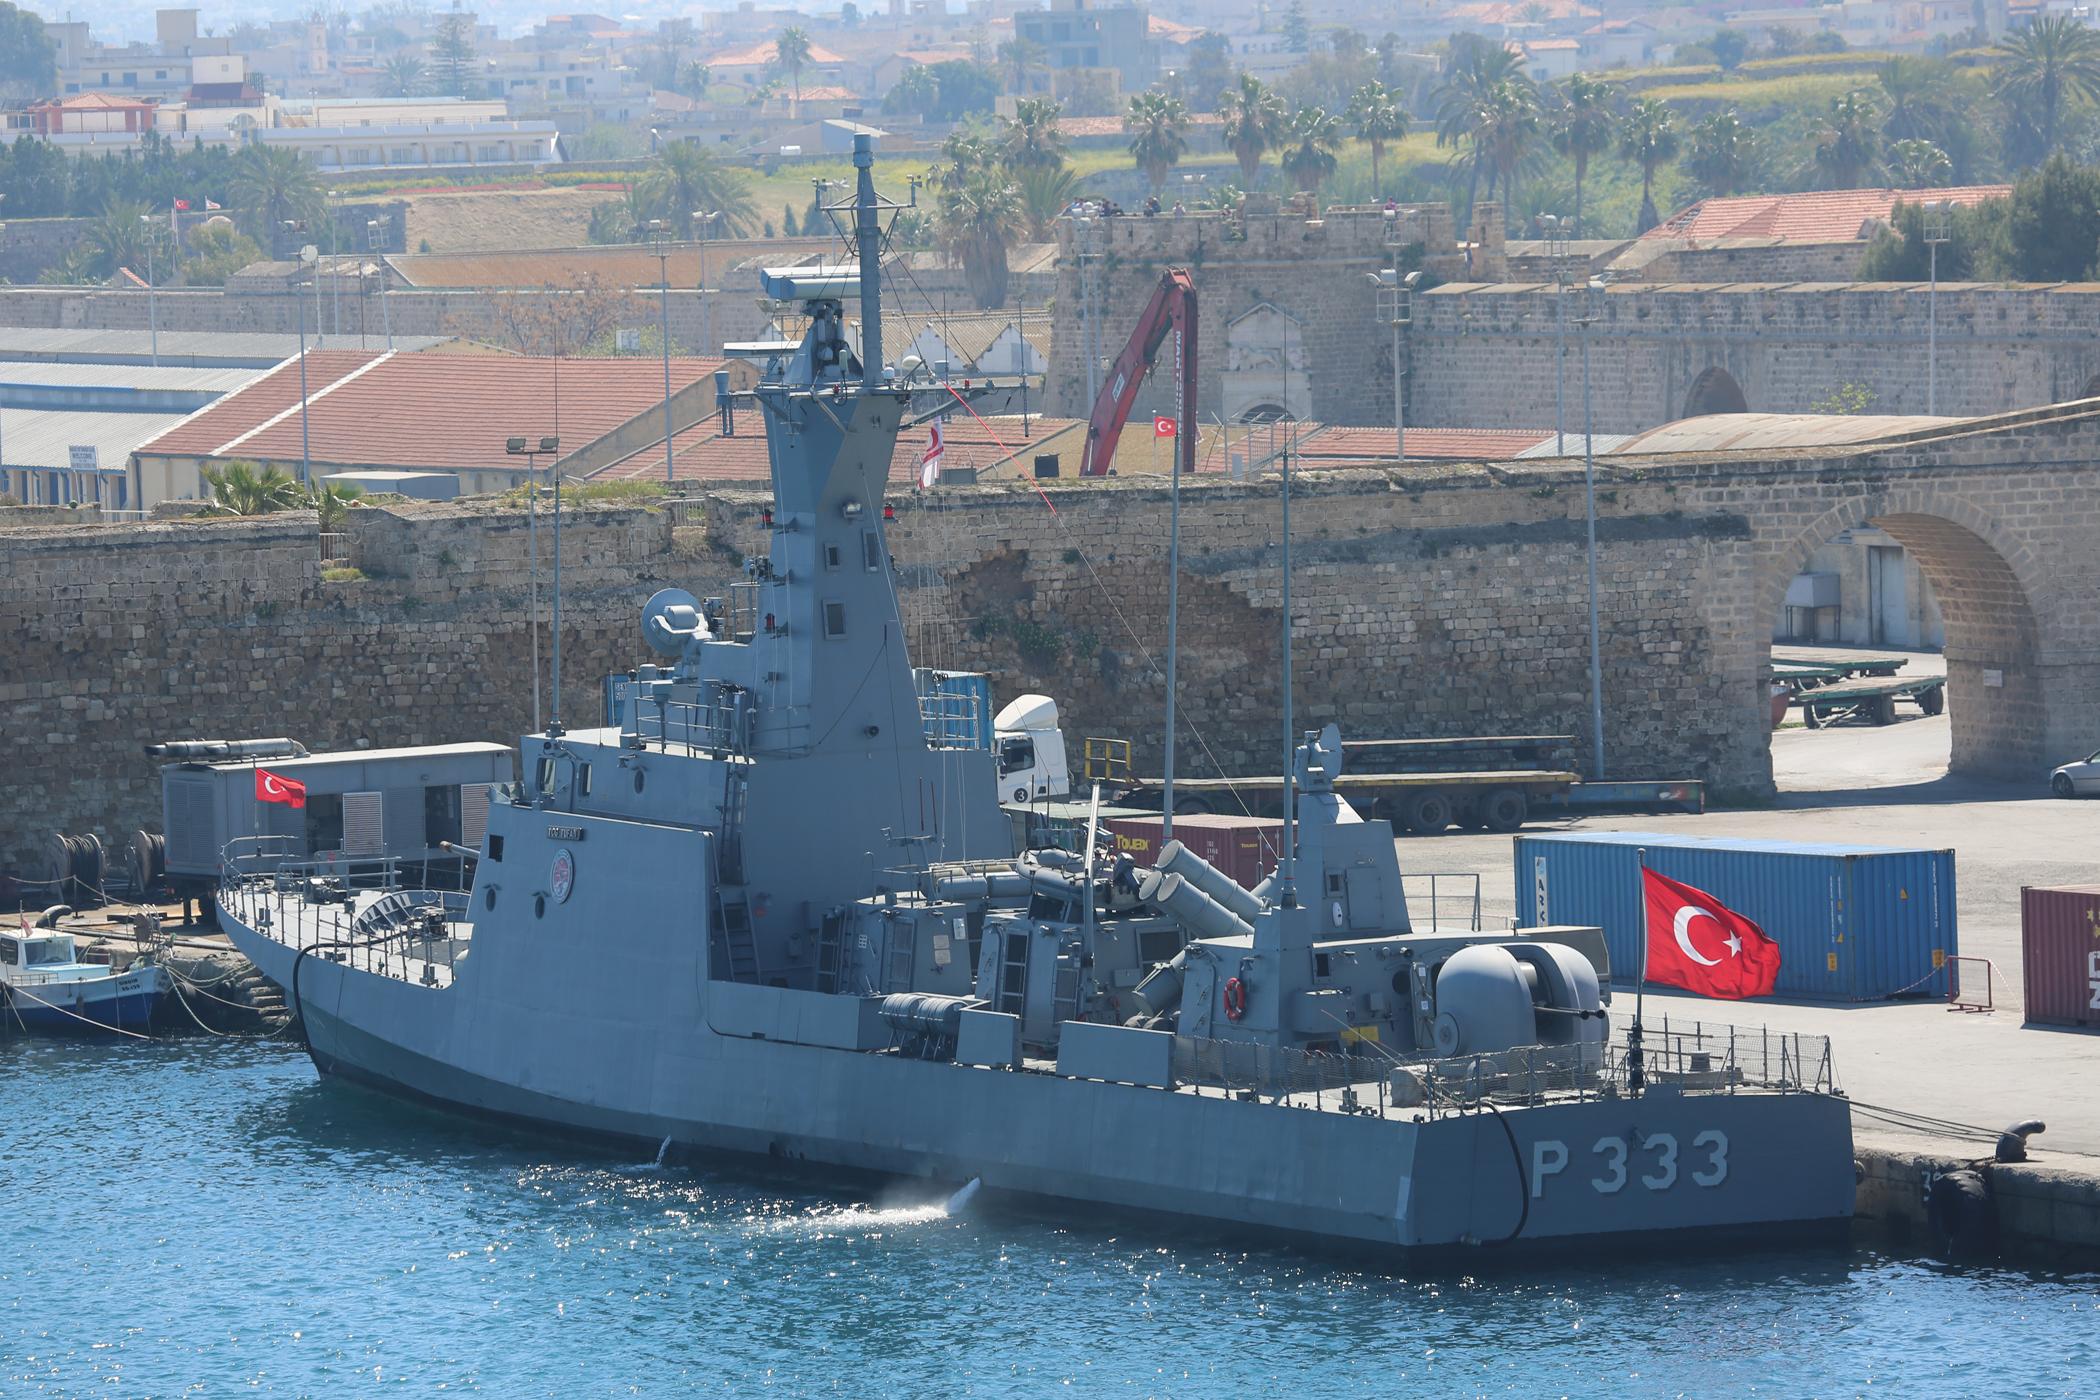 Turkish Navy - Marine Turque - Page 2 2789369